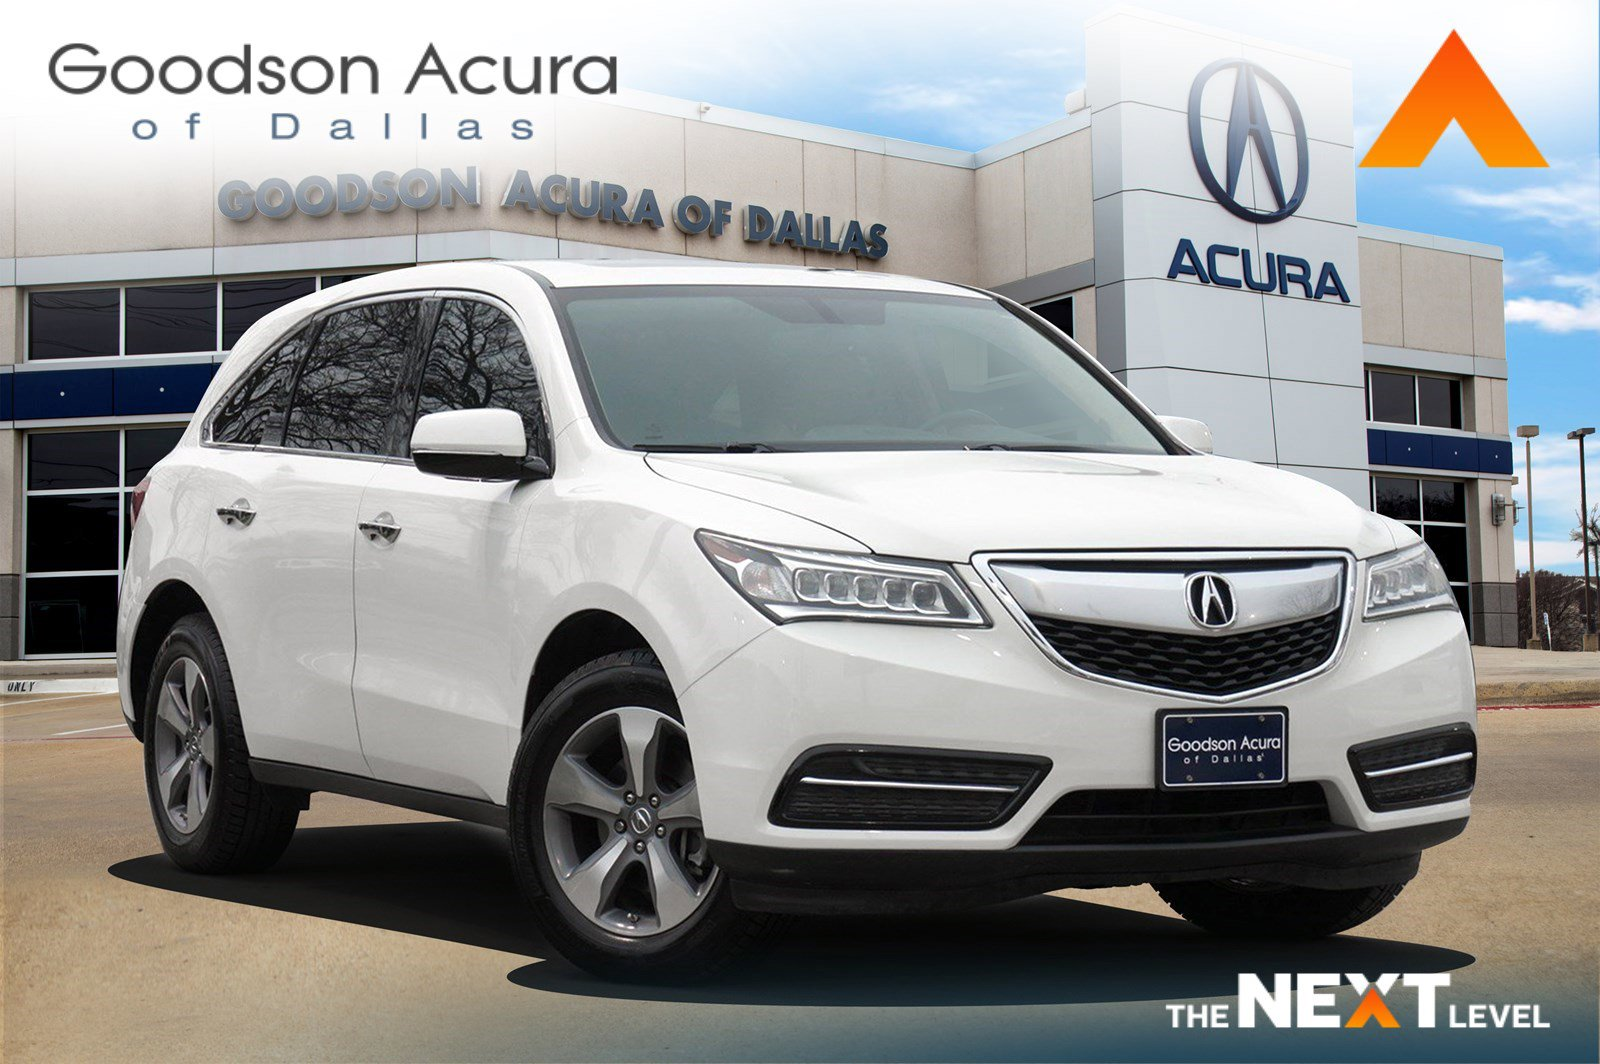 2014 Acura MDX SH-AWD image